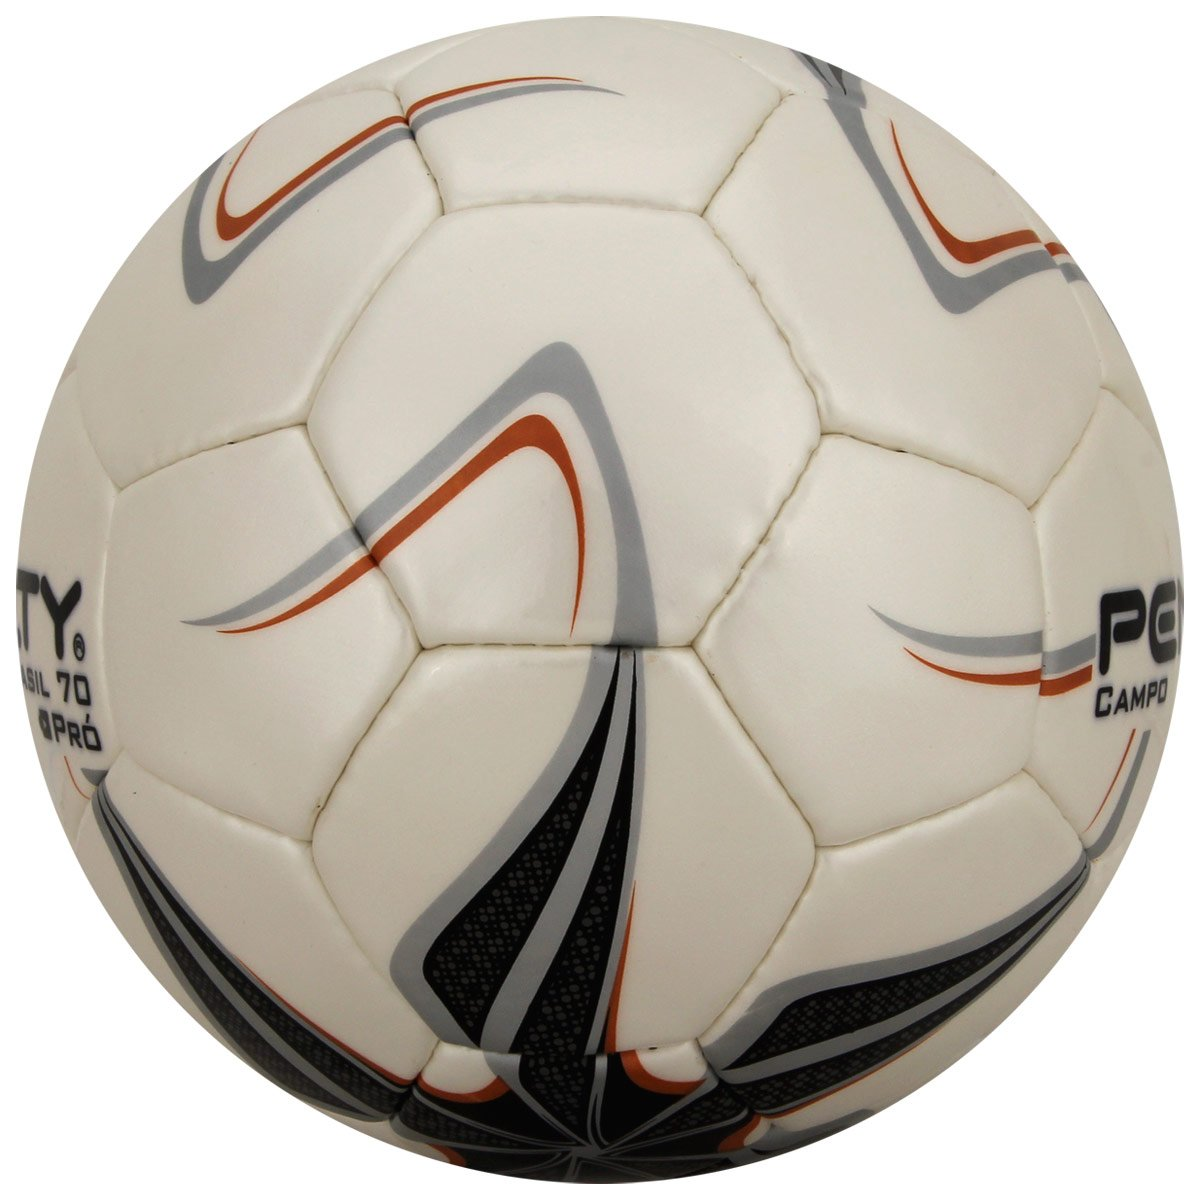 6a21ec78a9 Bola Futebol Penalty Brasil 70 Campo Infantil - Compre Agora